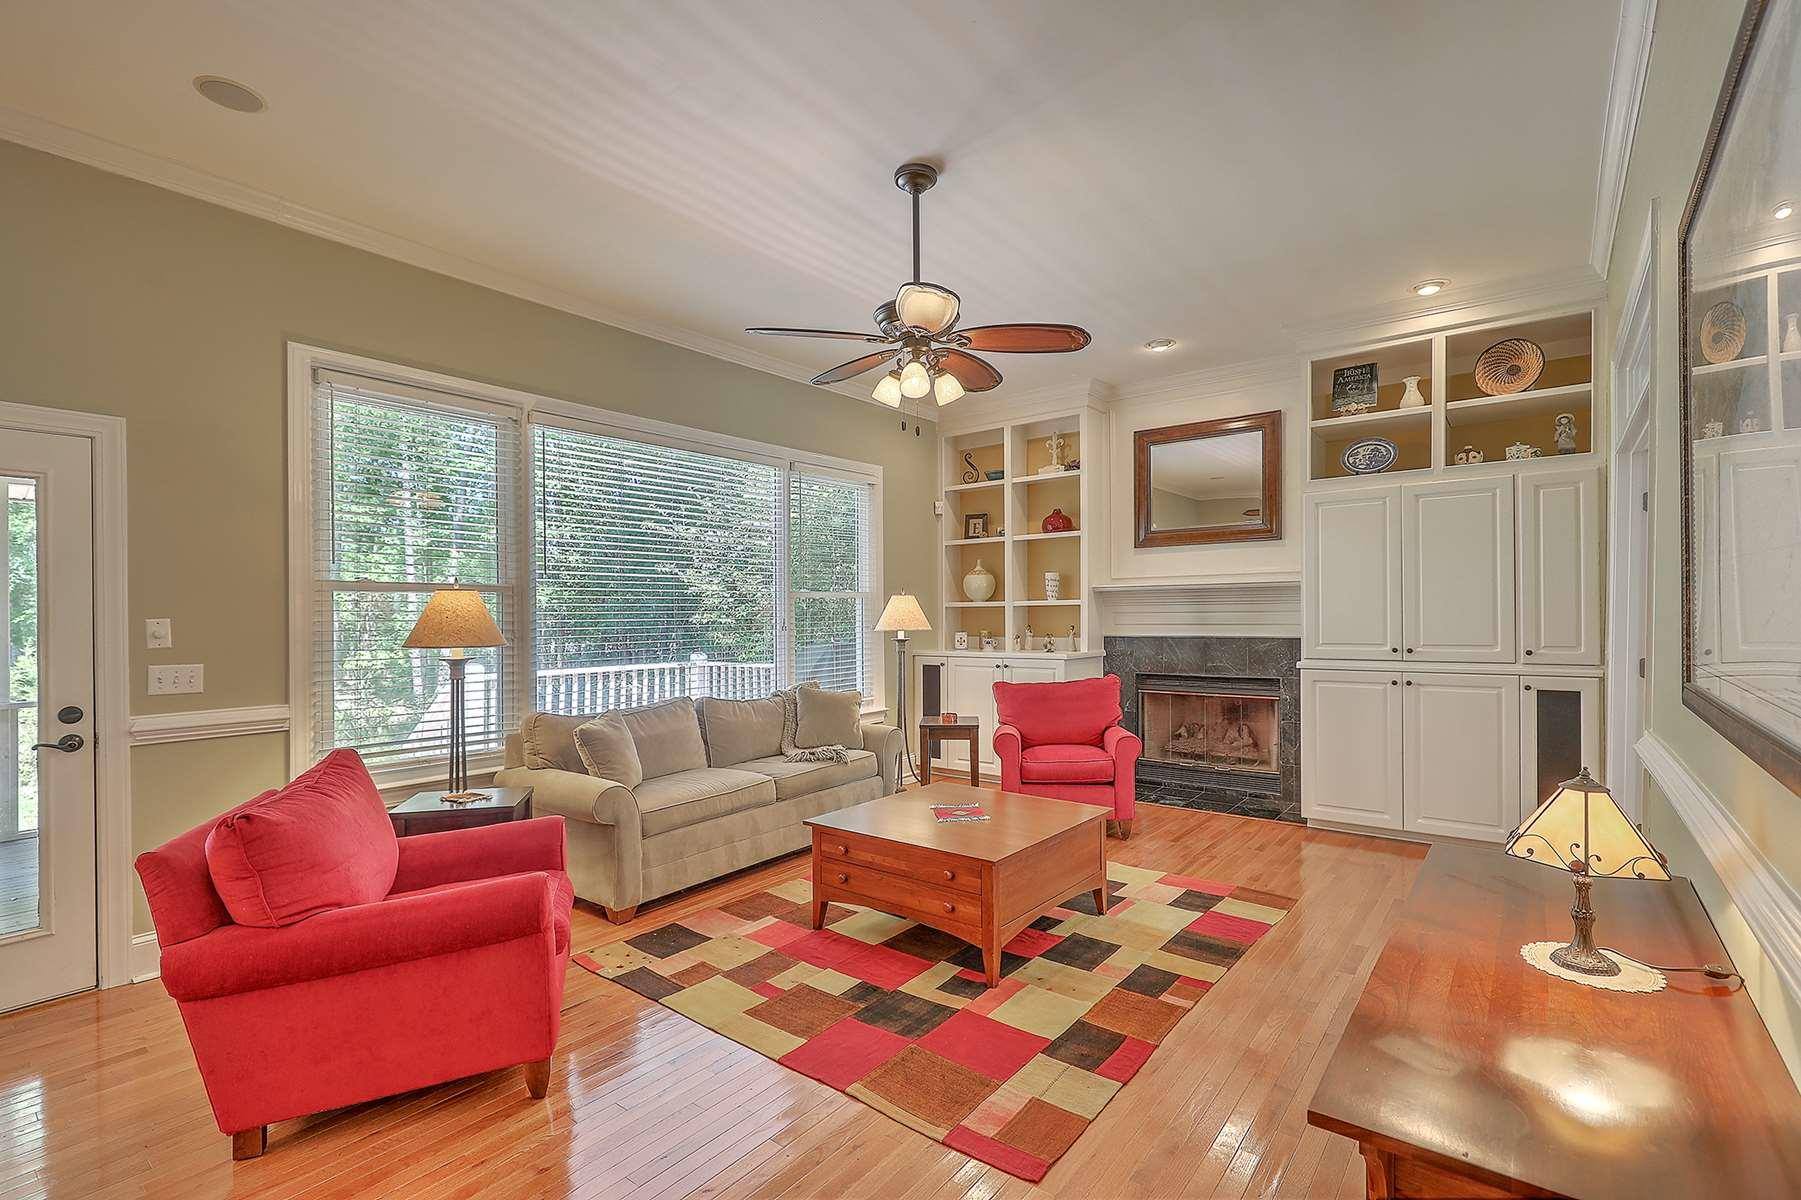 Dunes West Homes For Sale - 2961 Pignatelli, Mount Pleasant, SC - 0